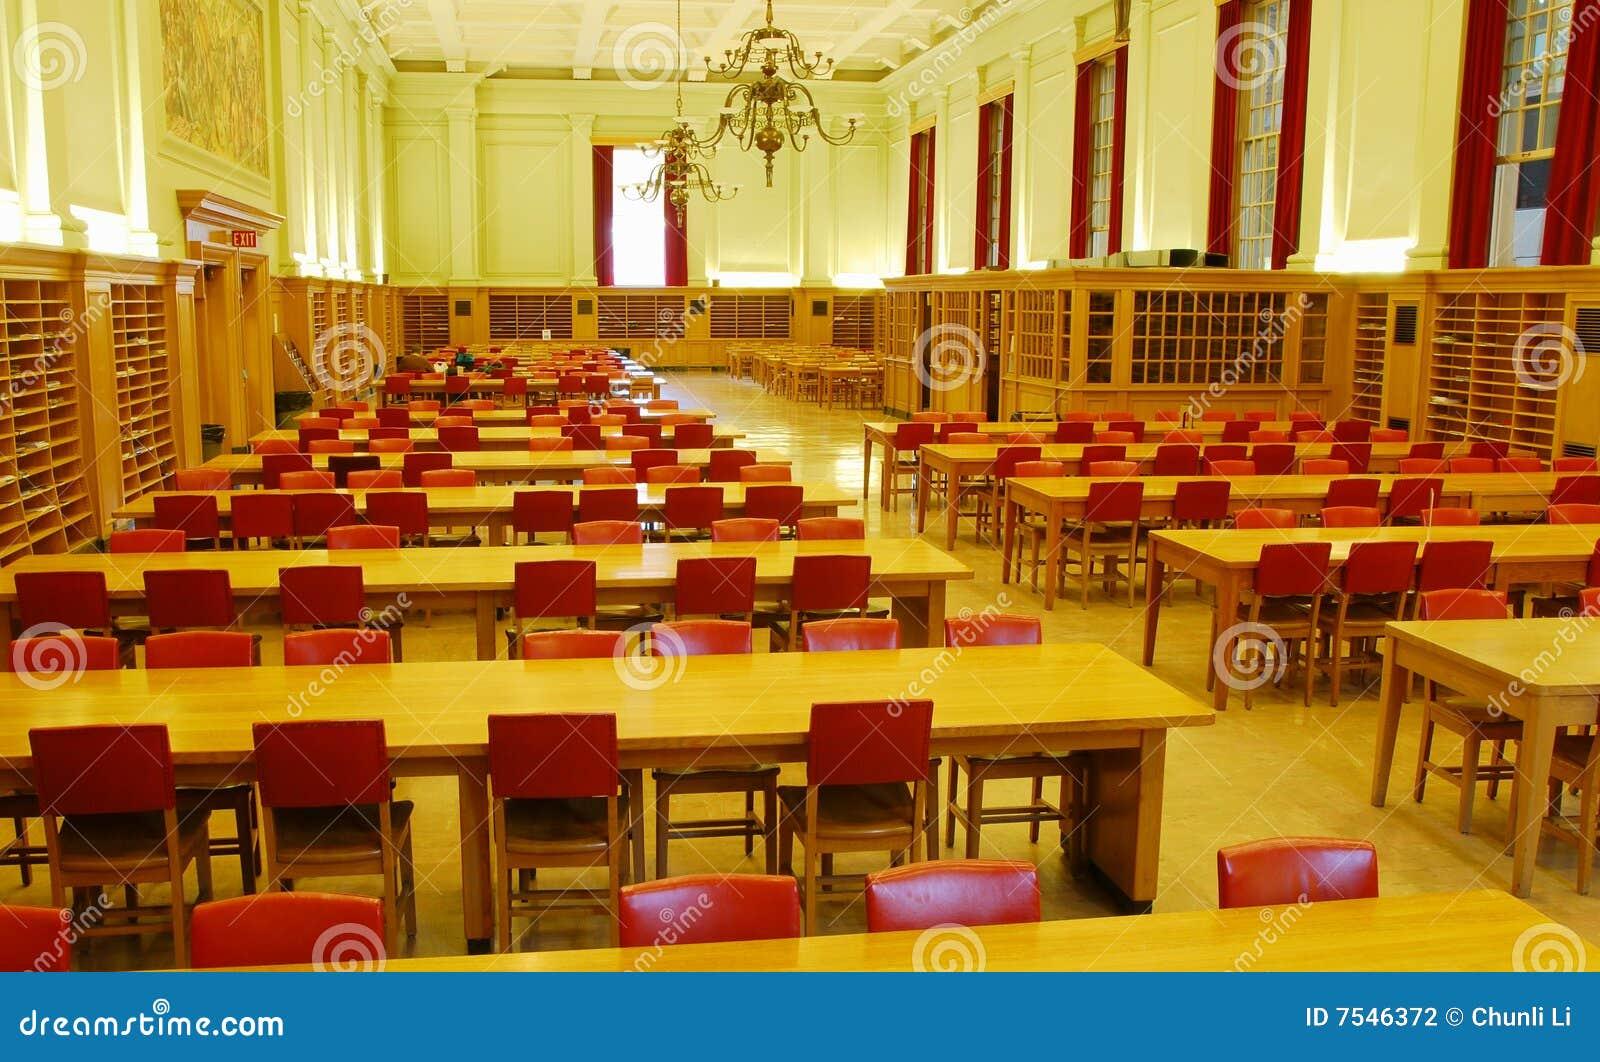 Study Hall Of University Library Stock Photography Image